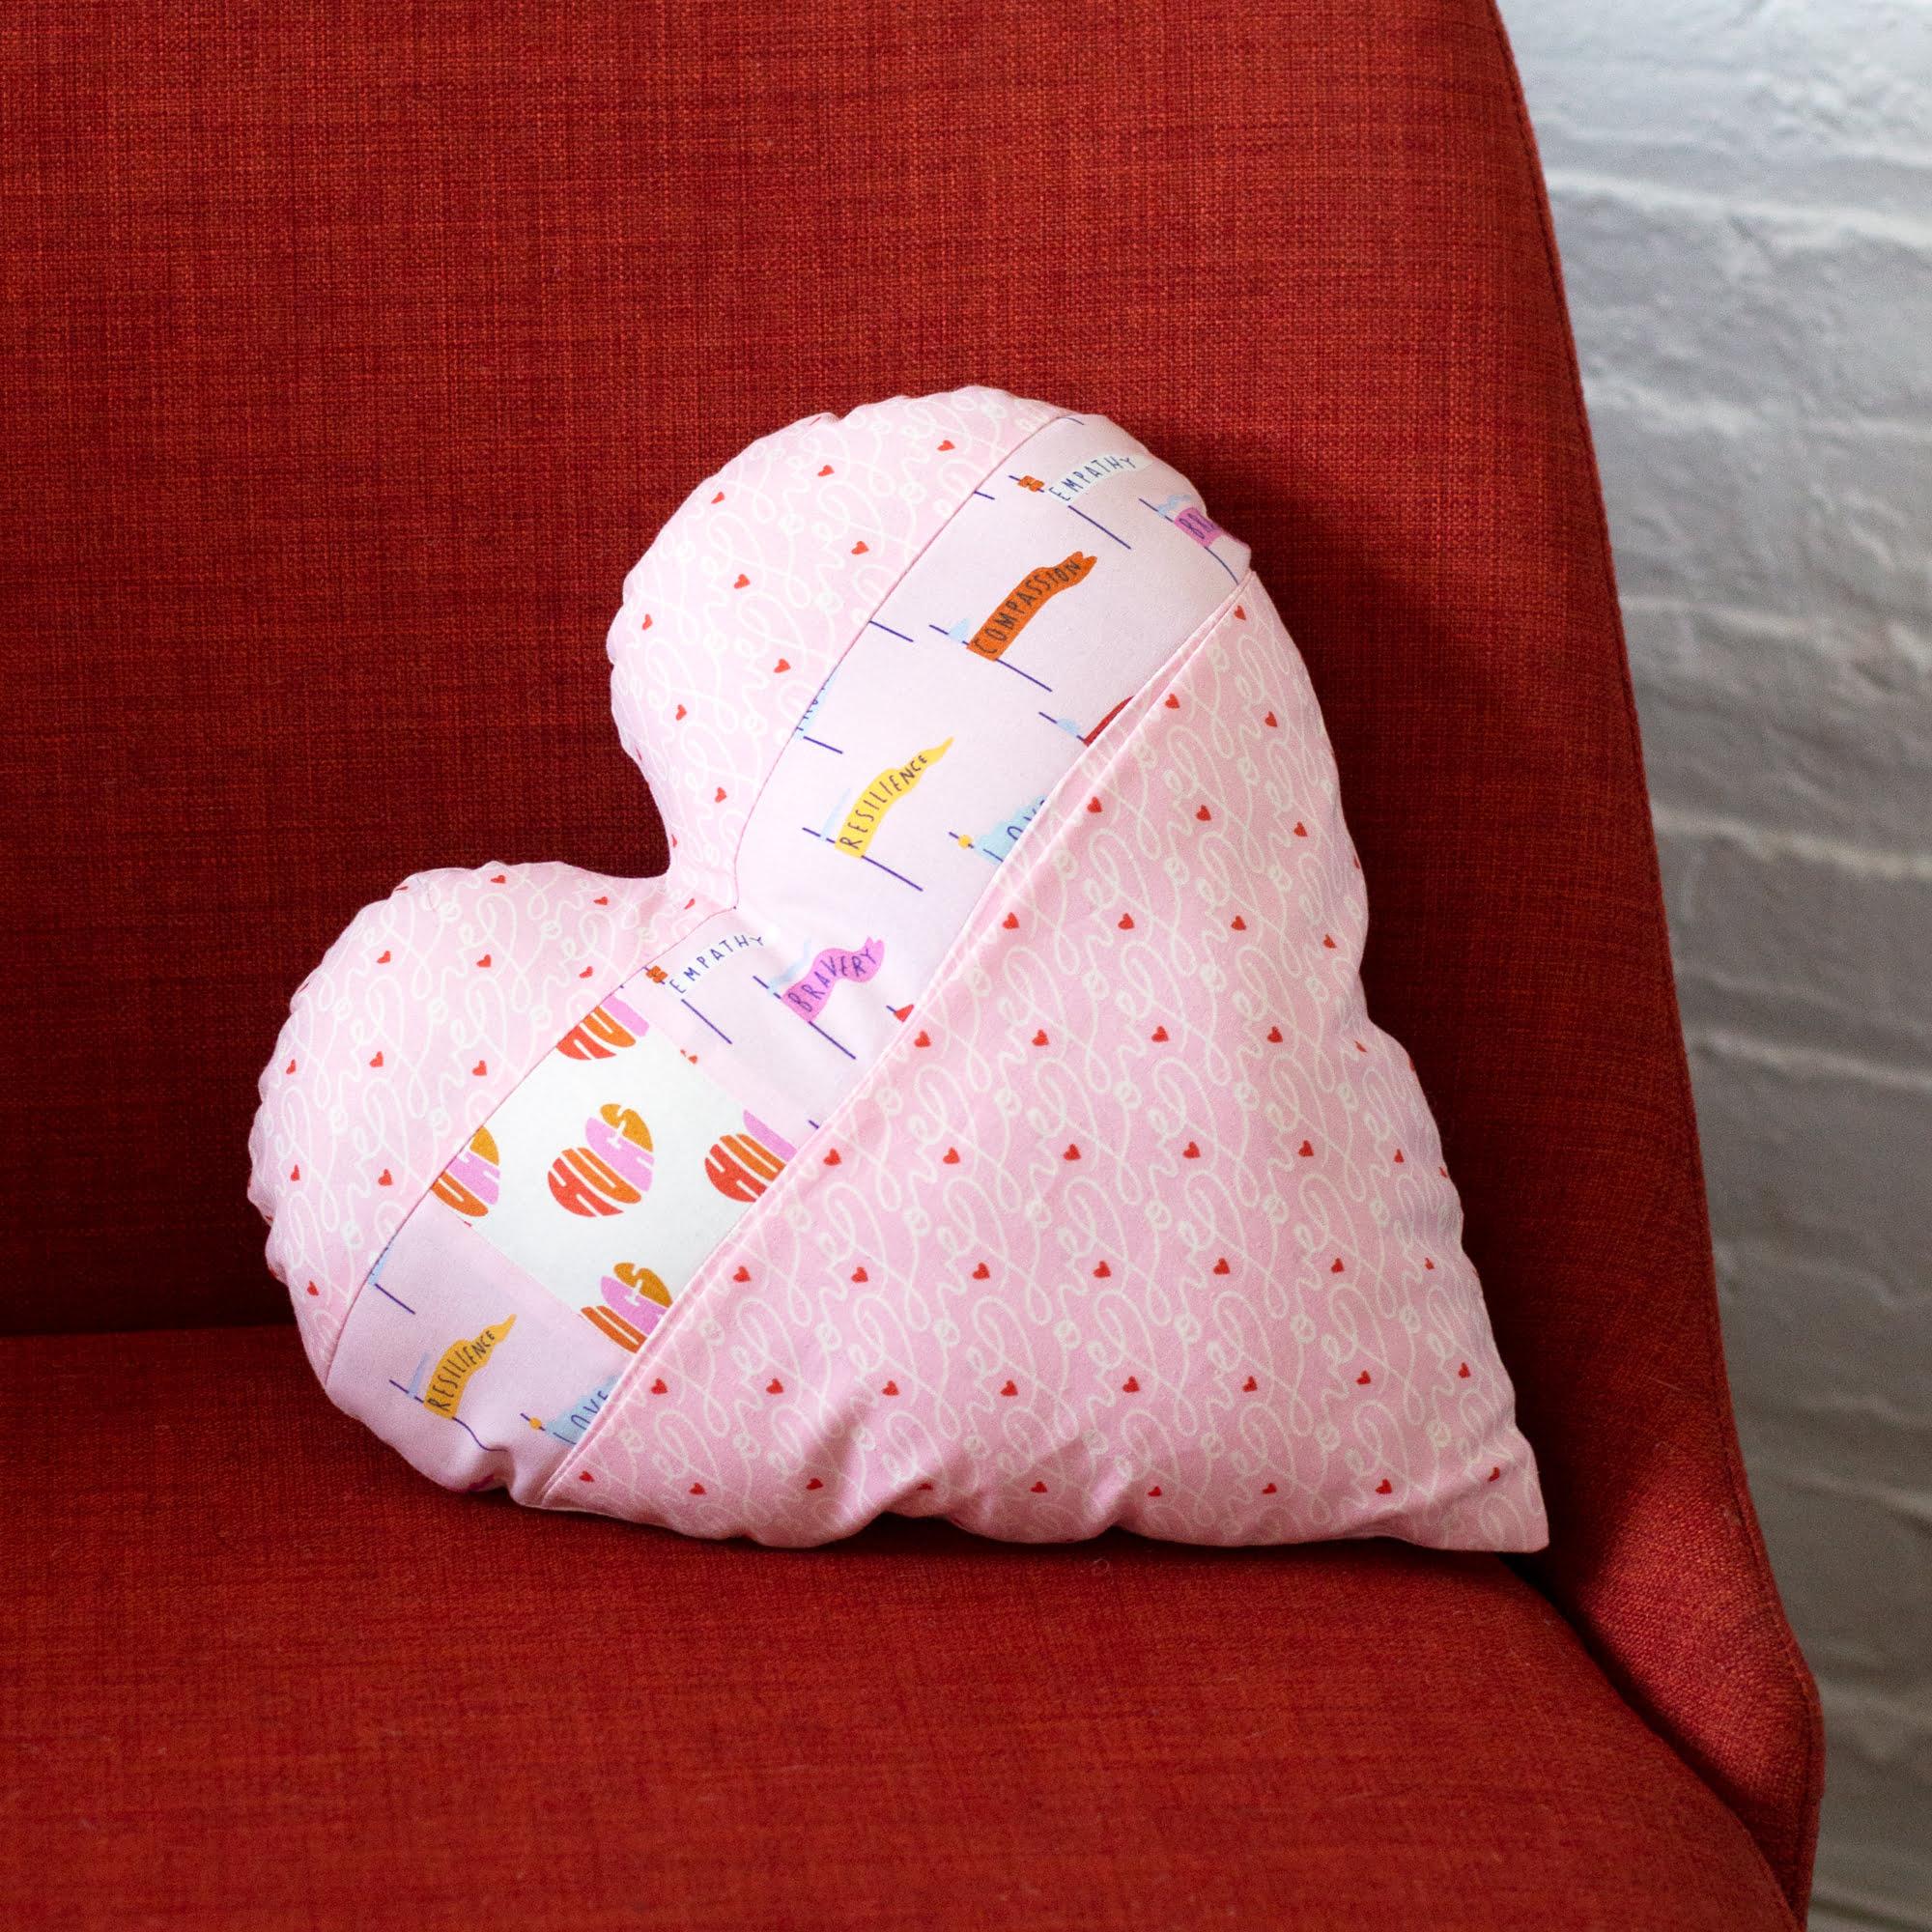 Pocket Full of Love Cushion Pattern by Cloud 9 Fabrics